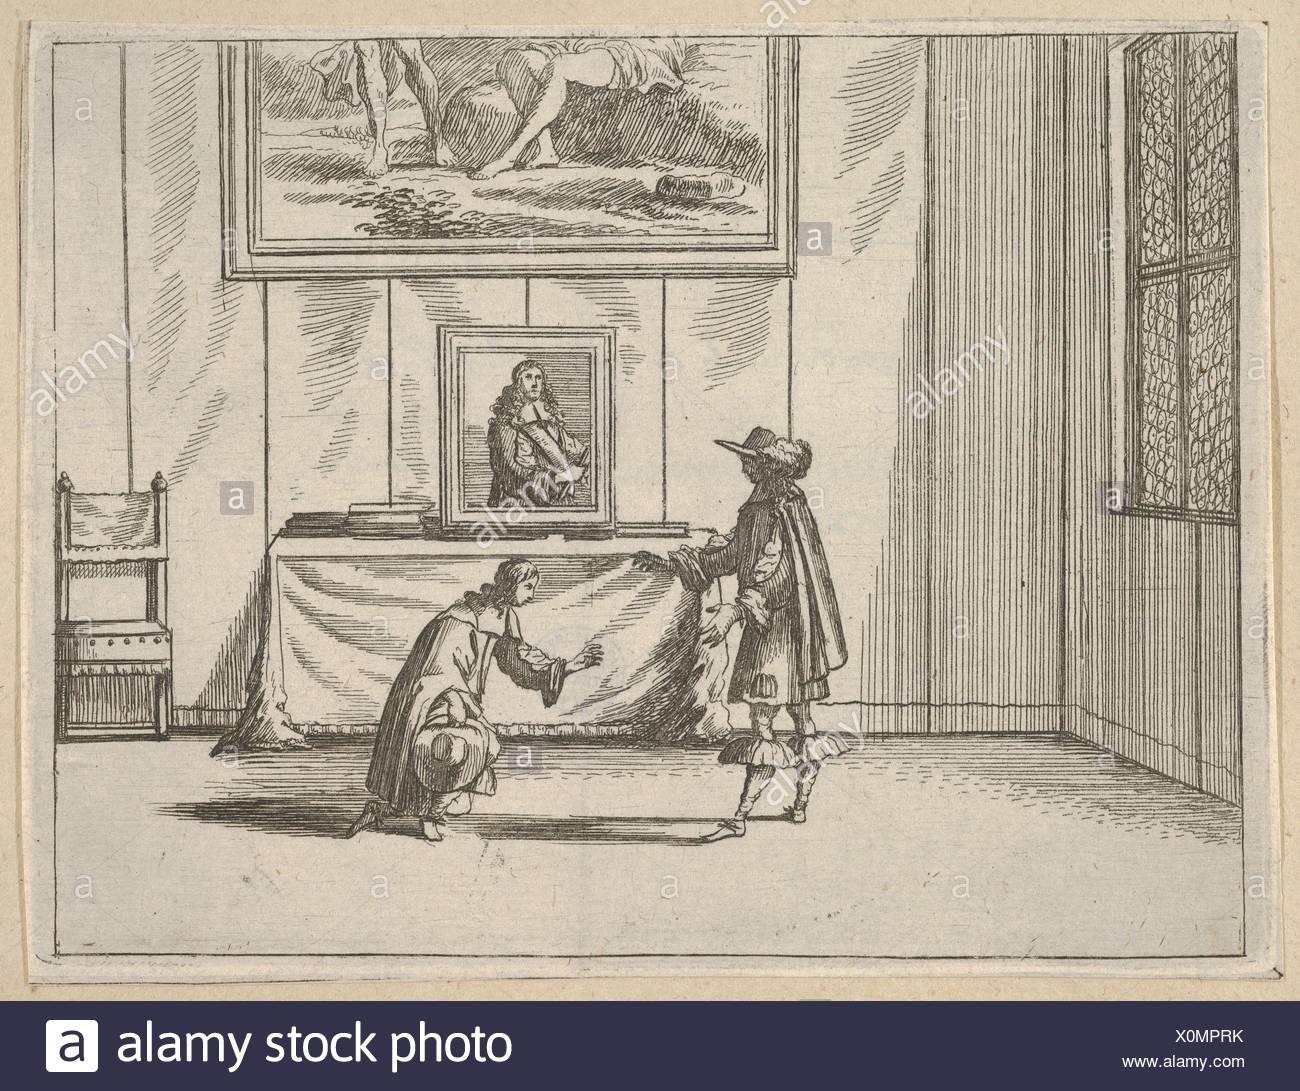 Francesco I d'Este est généreux en lui pardonnant les délinquants, de l'idea di un principe ed Eroe Cristiano dans Francesco I d'Este, di Modena e Reggio Photo Stock